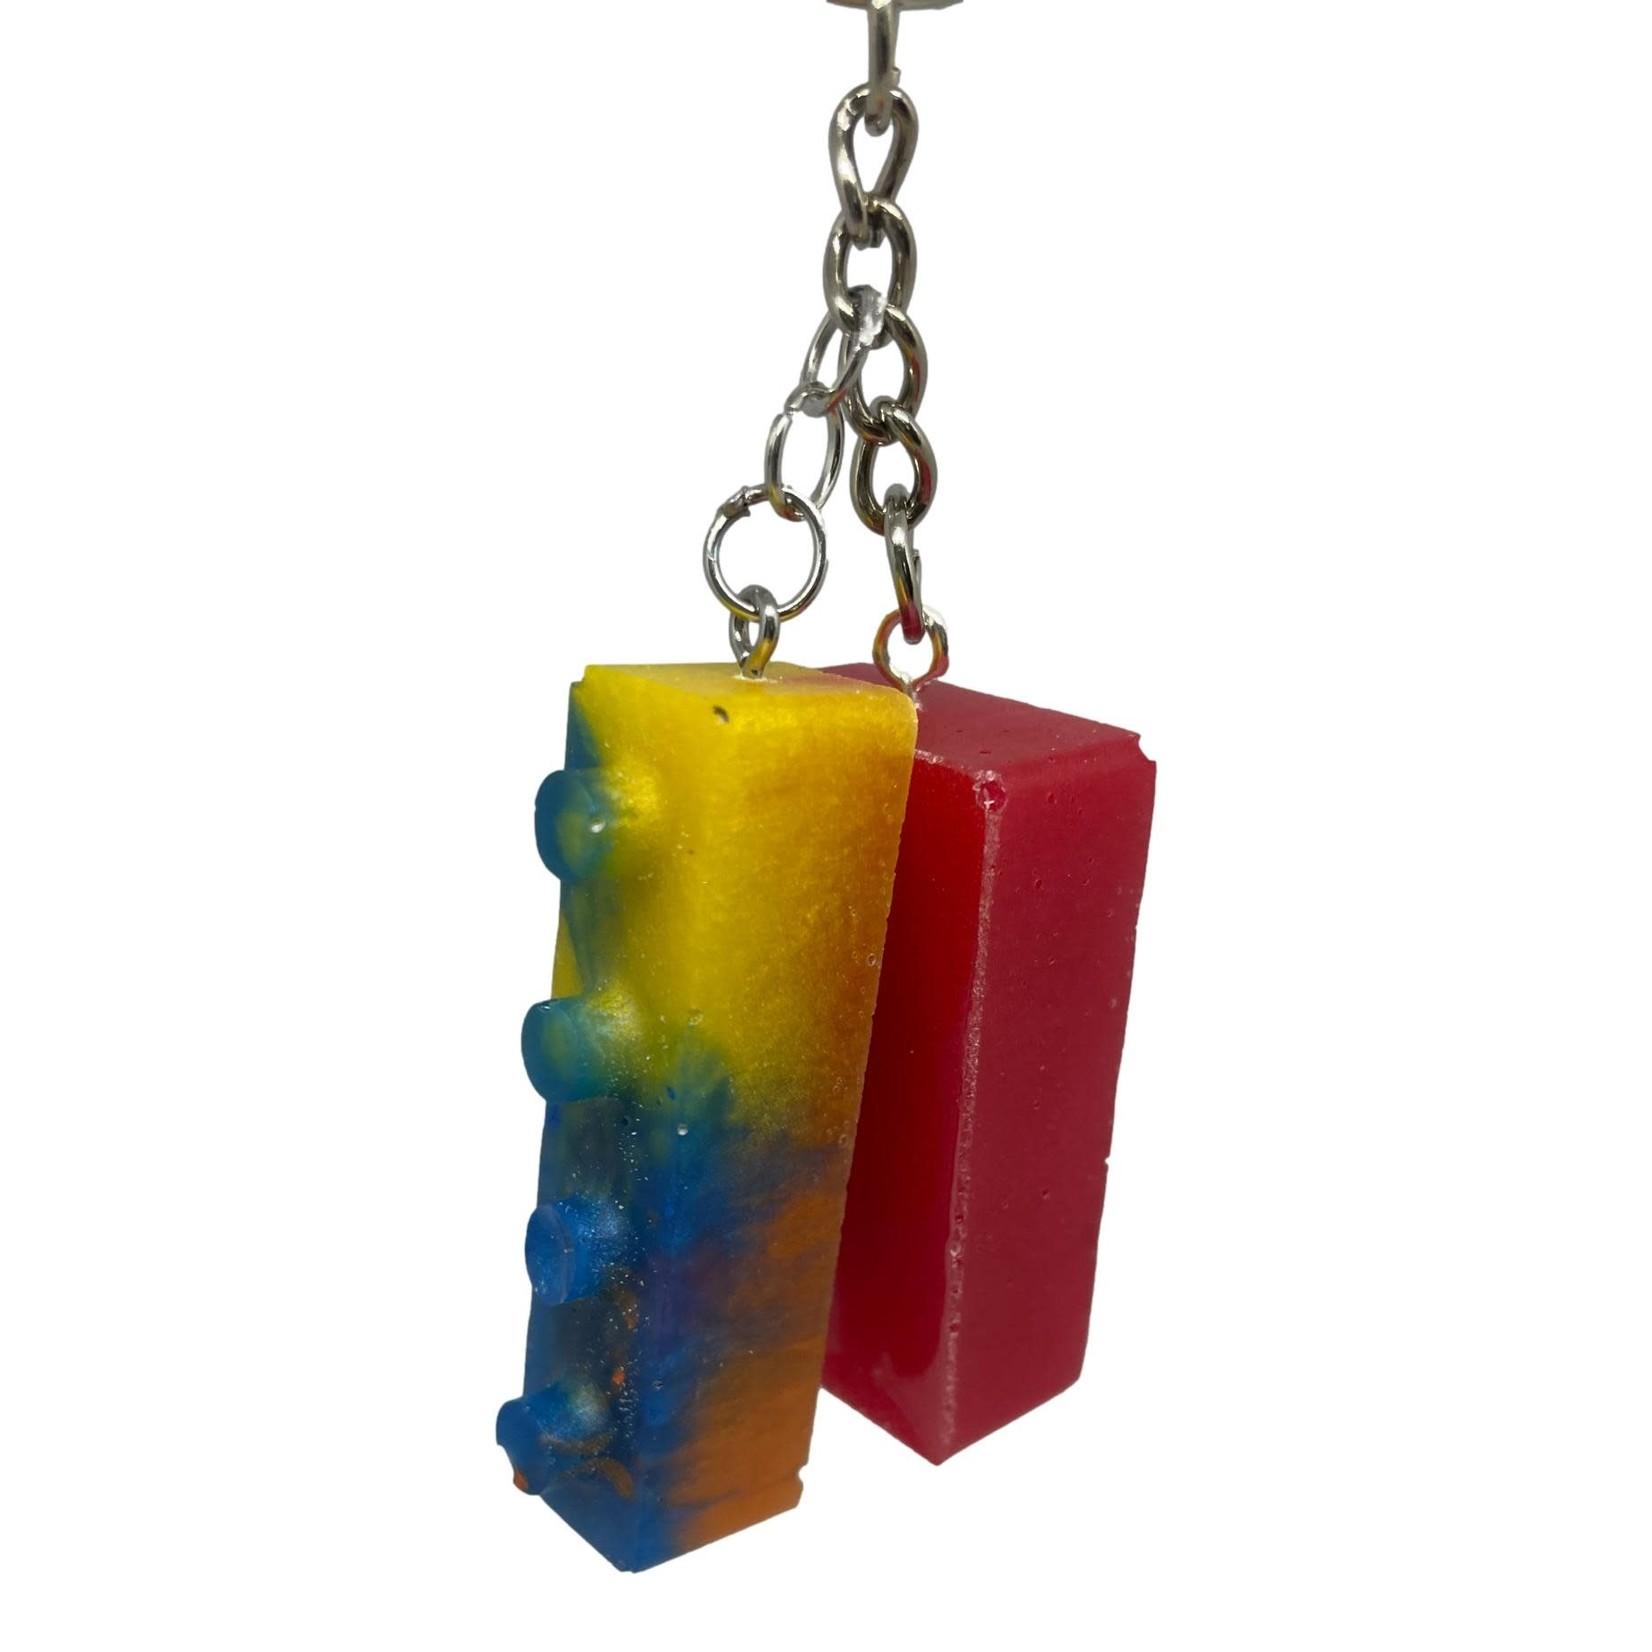 East Coast Sirens Red & Yellow Lego Key Chain